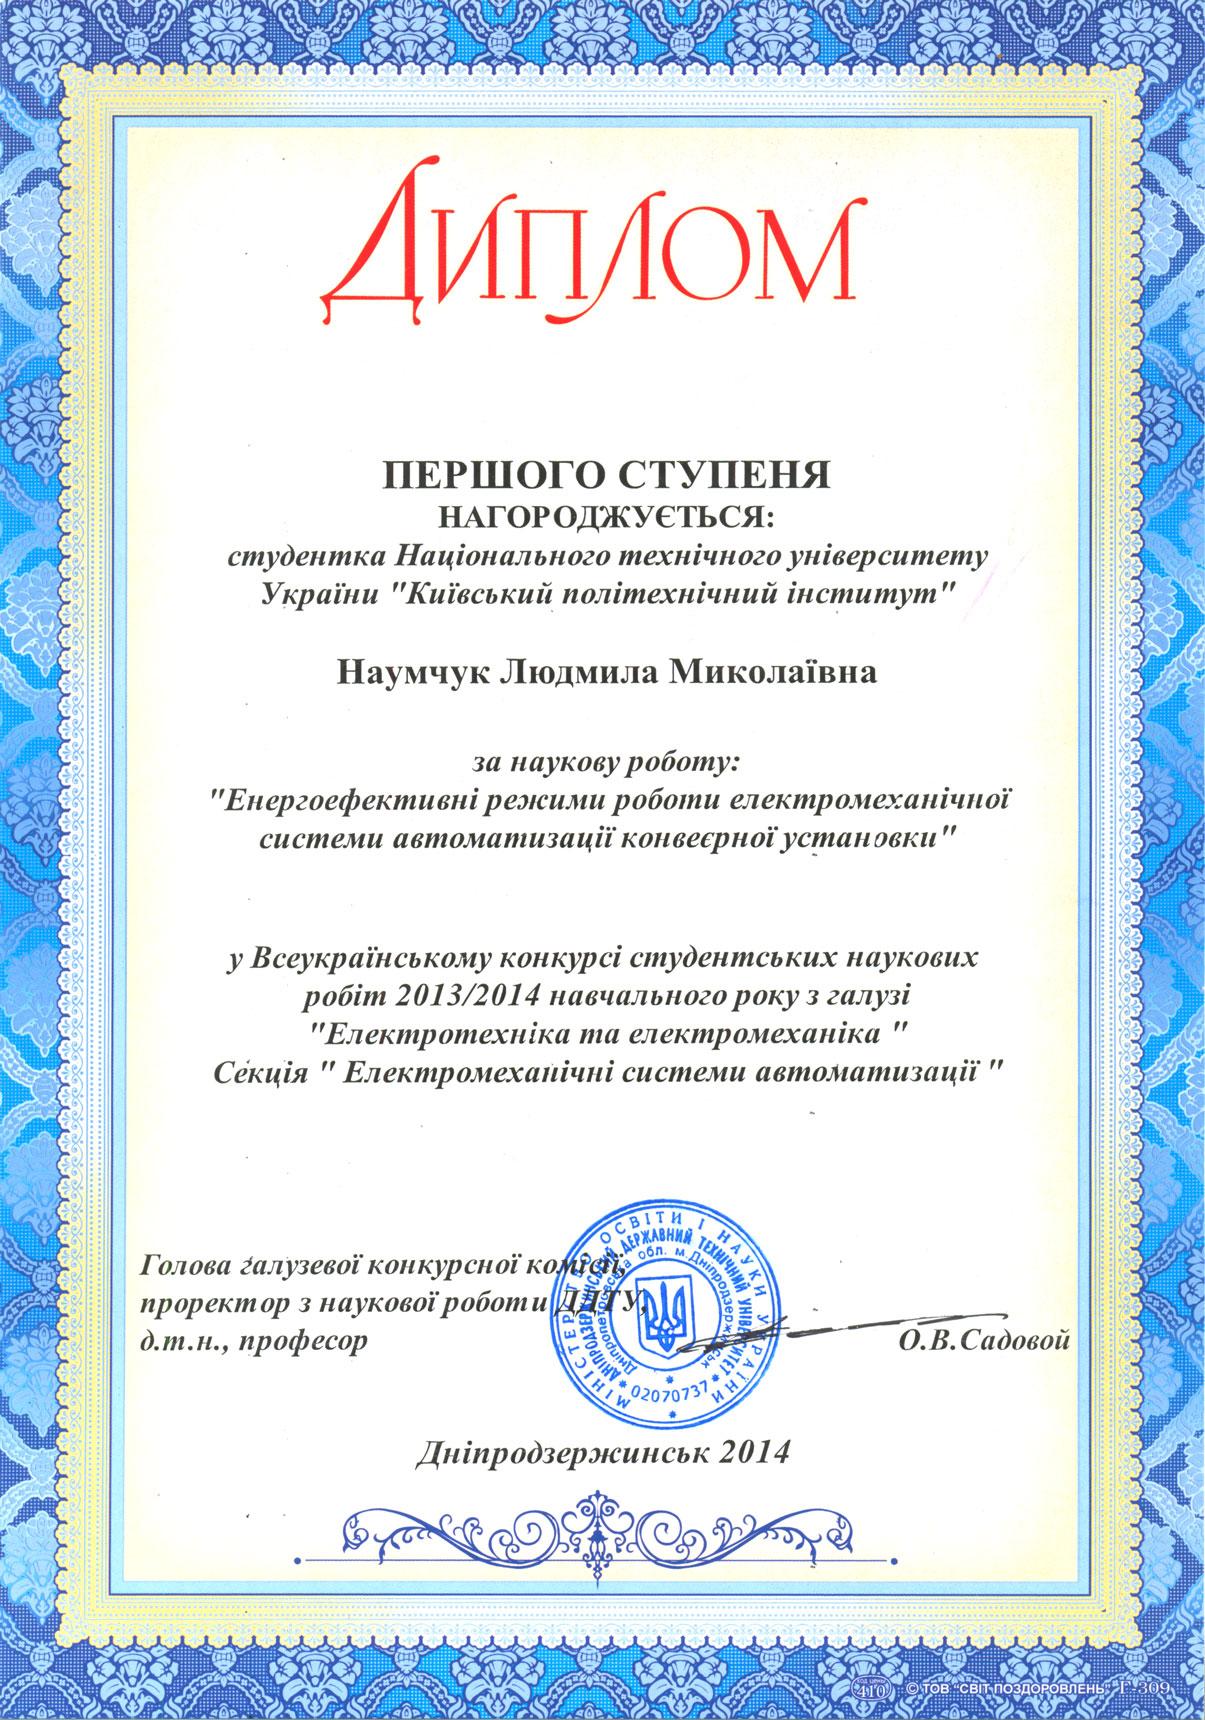 Всеукраїнський конкурс студентських наукових робіт 2014 diplom_luda